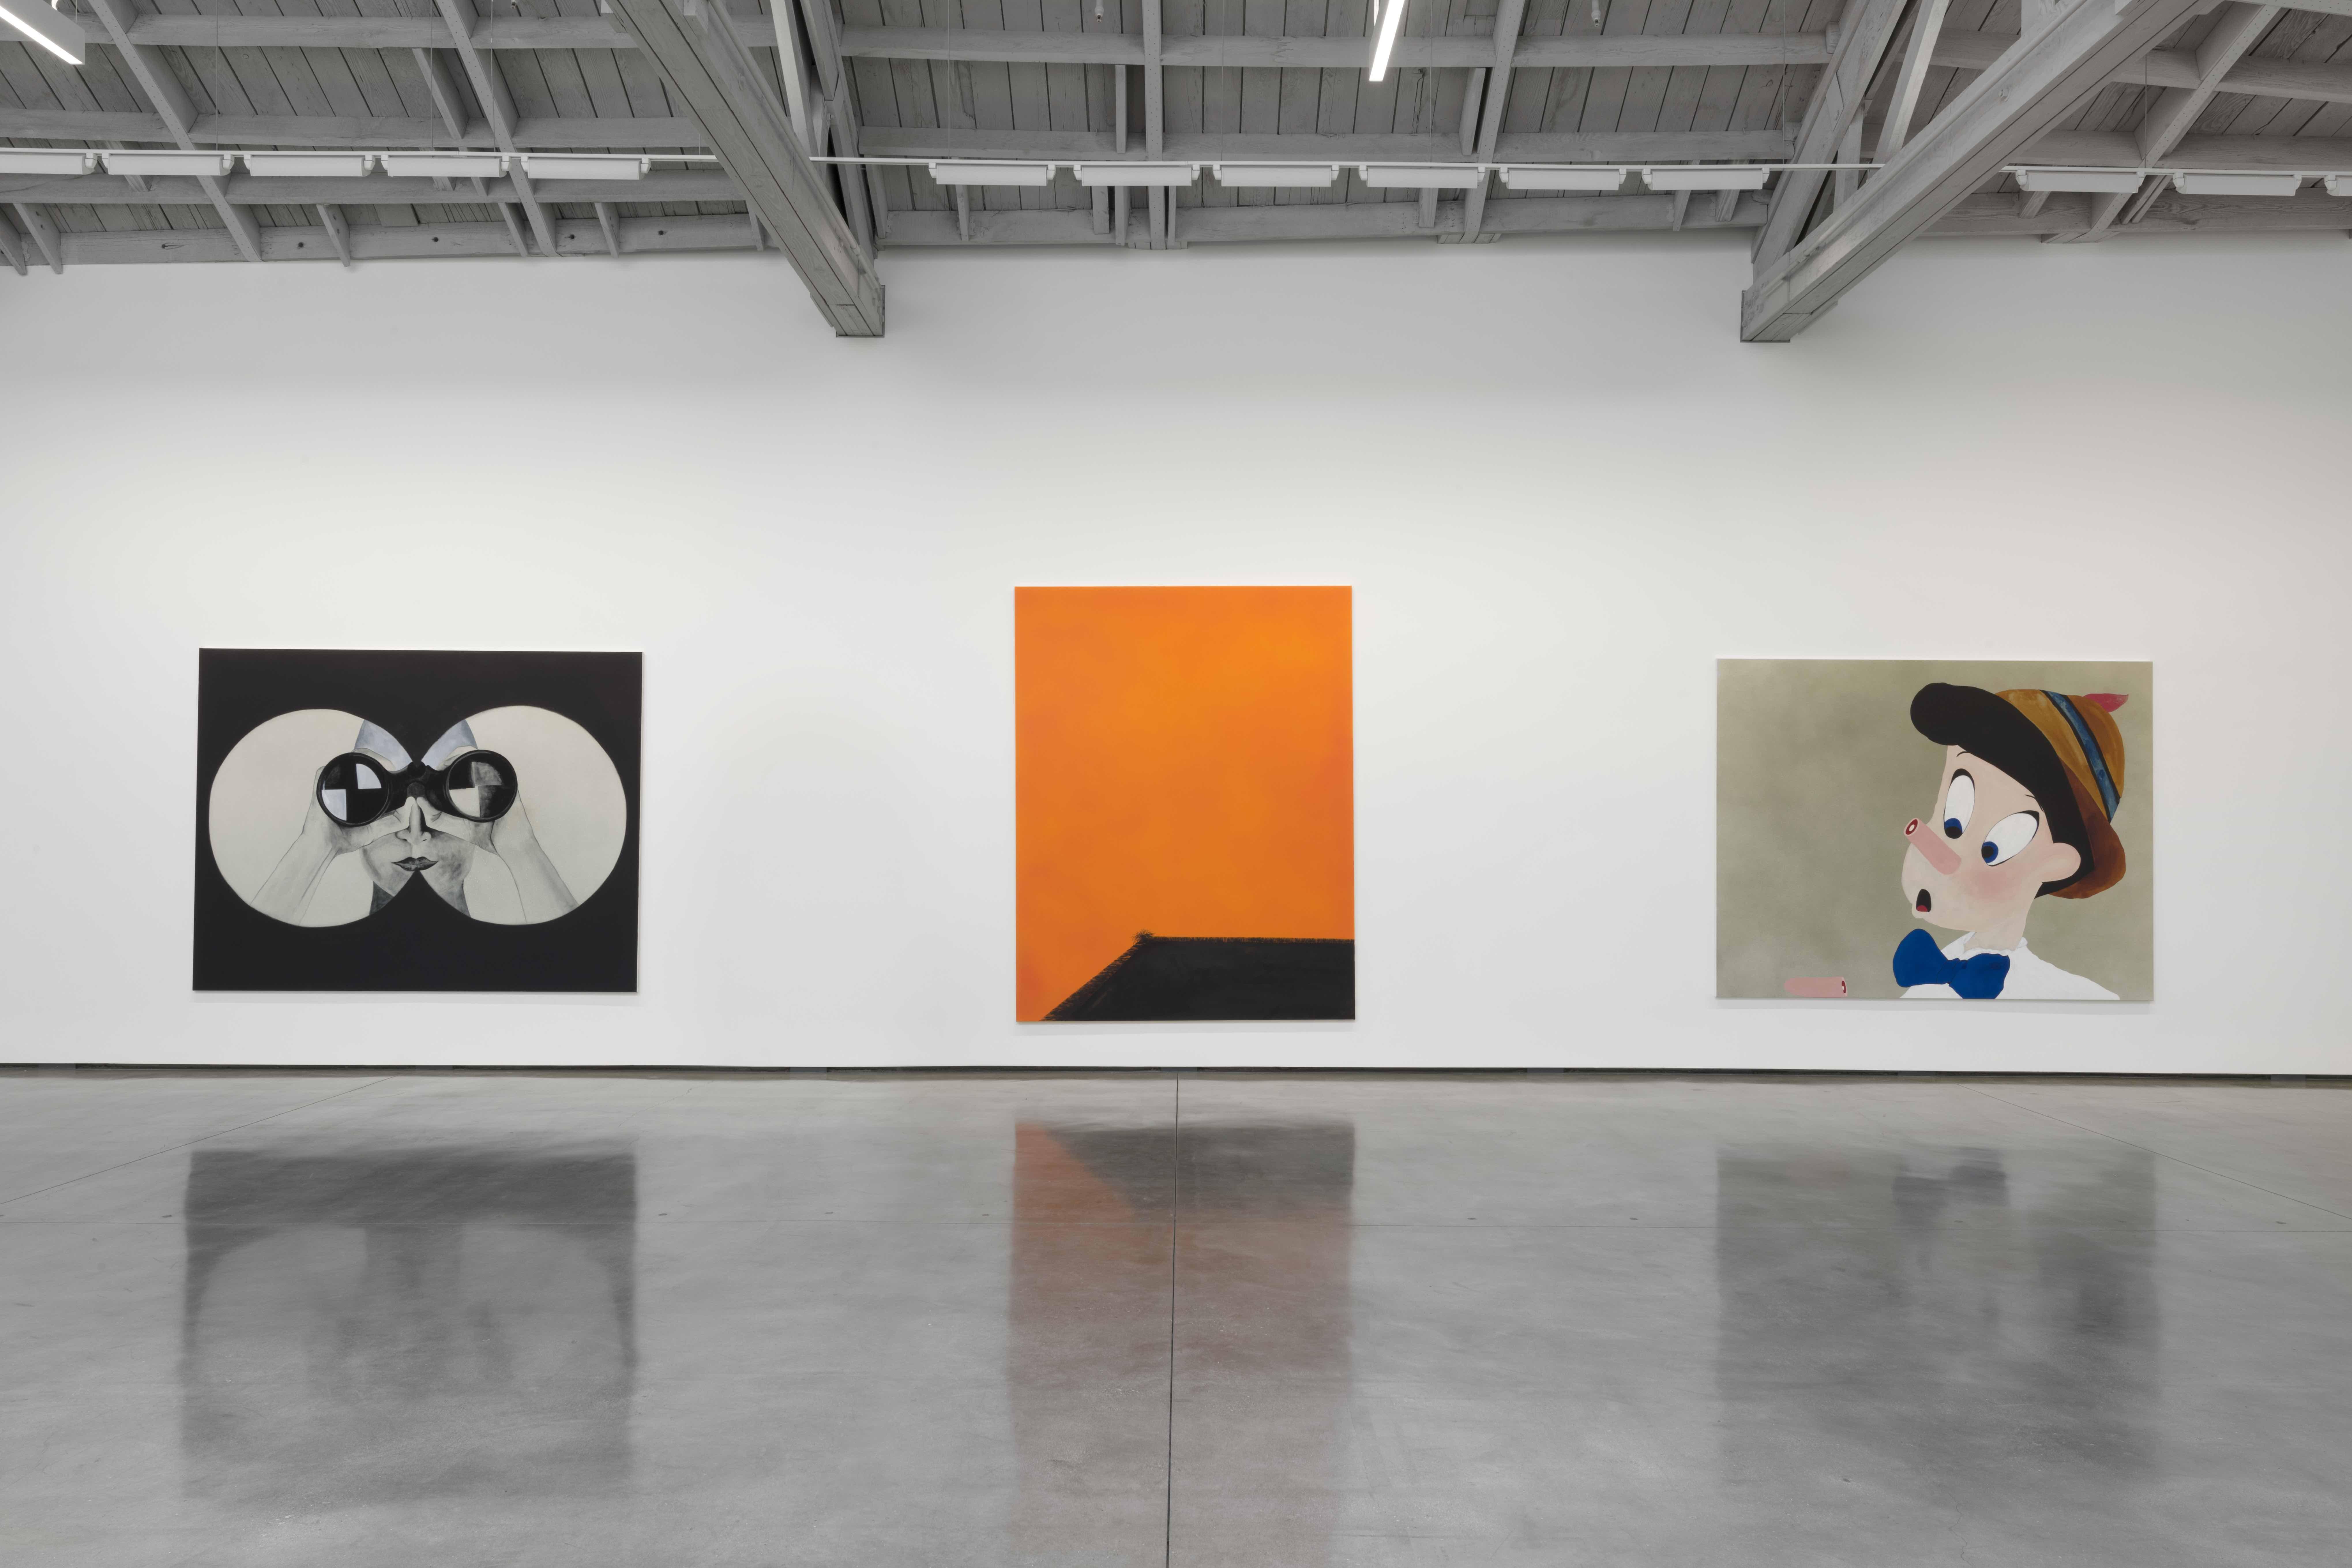 Calvin Marcus, GO HANG A SALAMI IM A LASAGNA HOG, David Kordansky Gallery, Los Angeles (November 1, 2019—January 11, 2020), Installation view, Photography: Jeff McLane